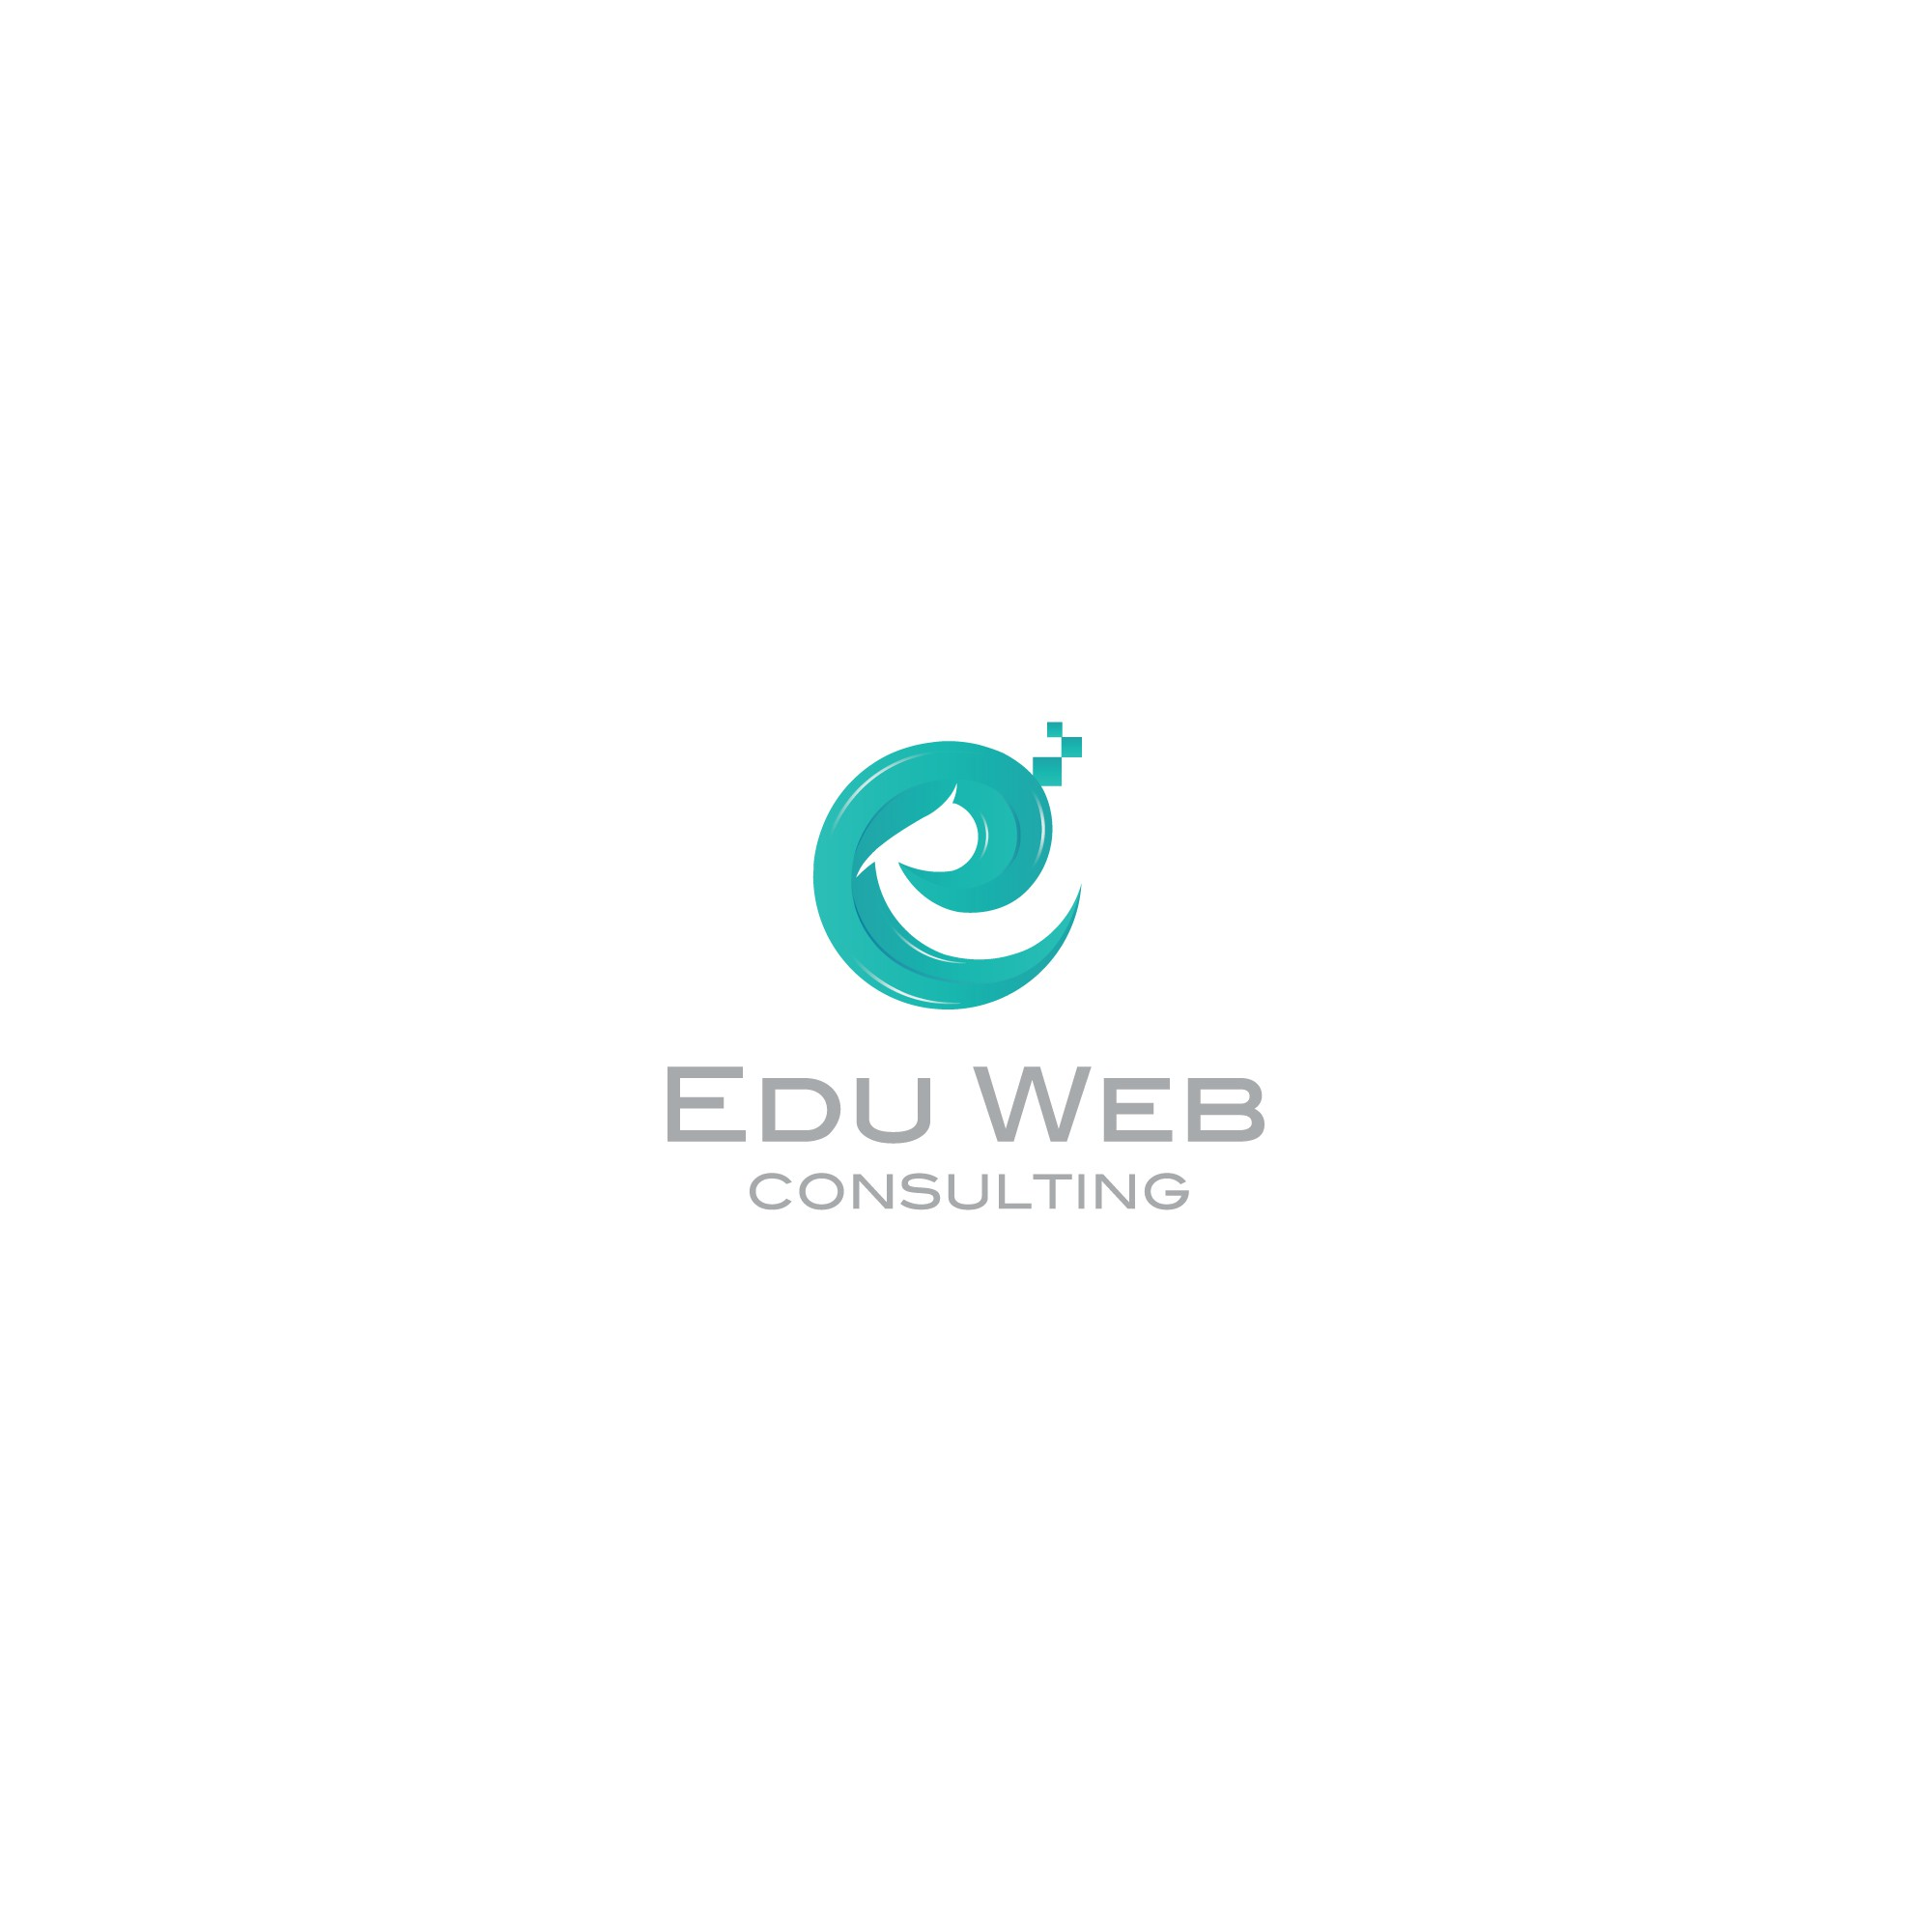 Software and Education company logo